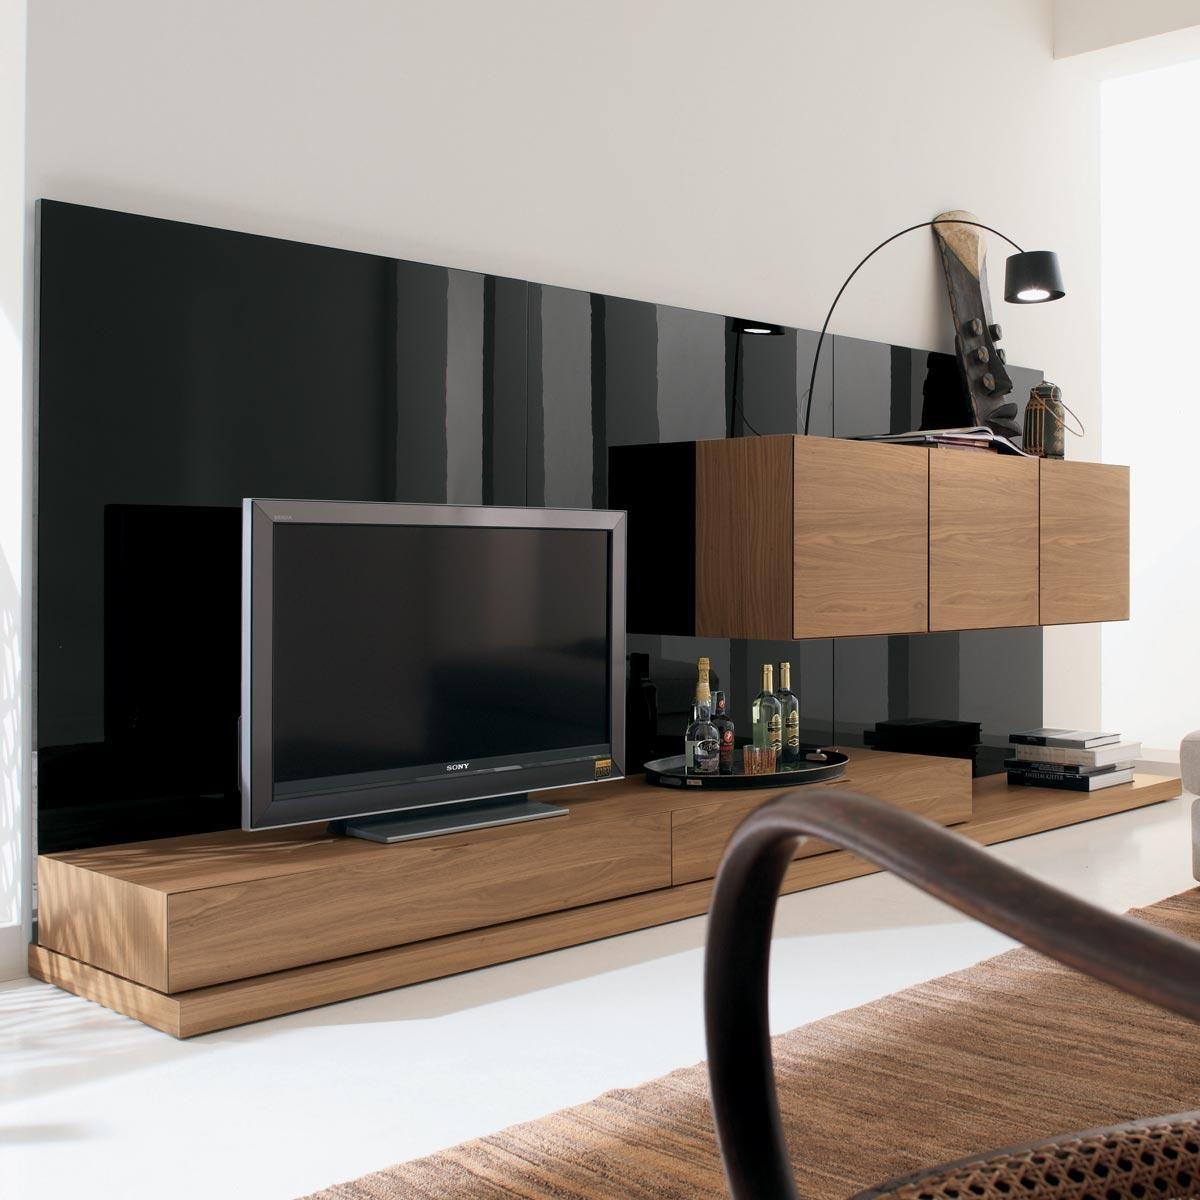 Modern tv stand. Modern tv stand   TV UNIT   Pinterest   Furniture  Media cabinet